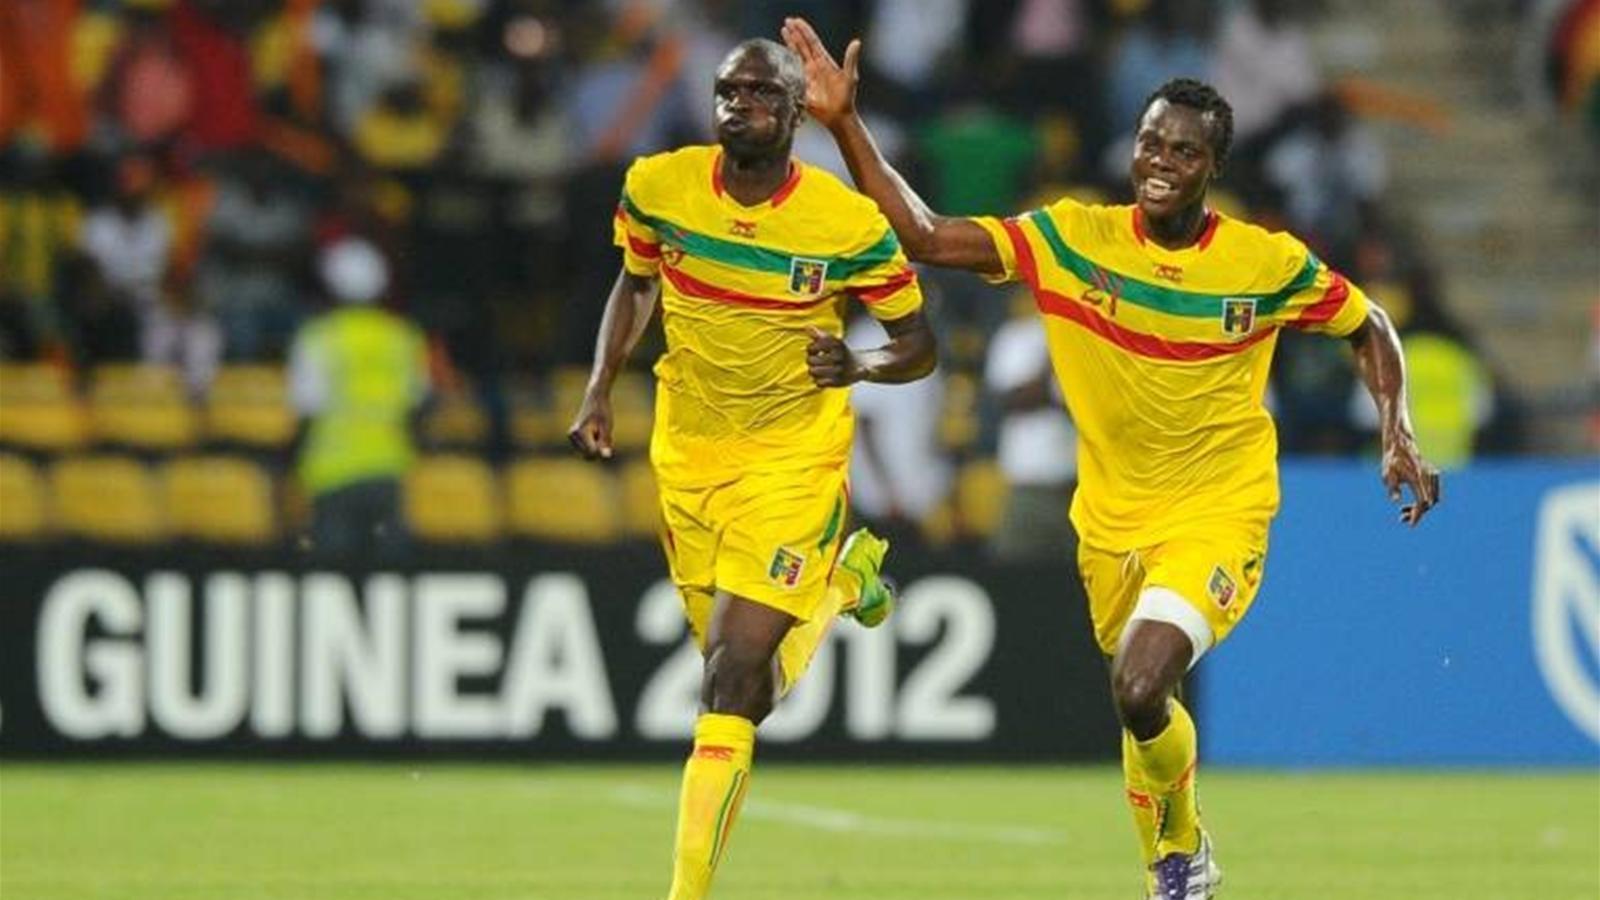 le mali avec le ghana coupe d 39 afrique des nations 2012 football eurosport. Black Bedroom Furniture Sets. Home Design Ideas